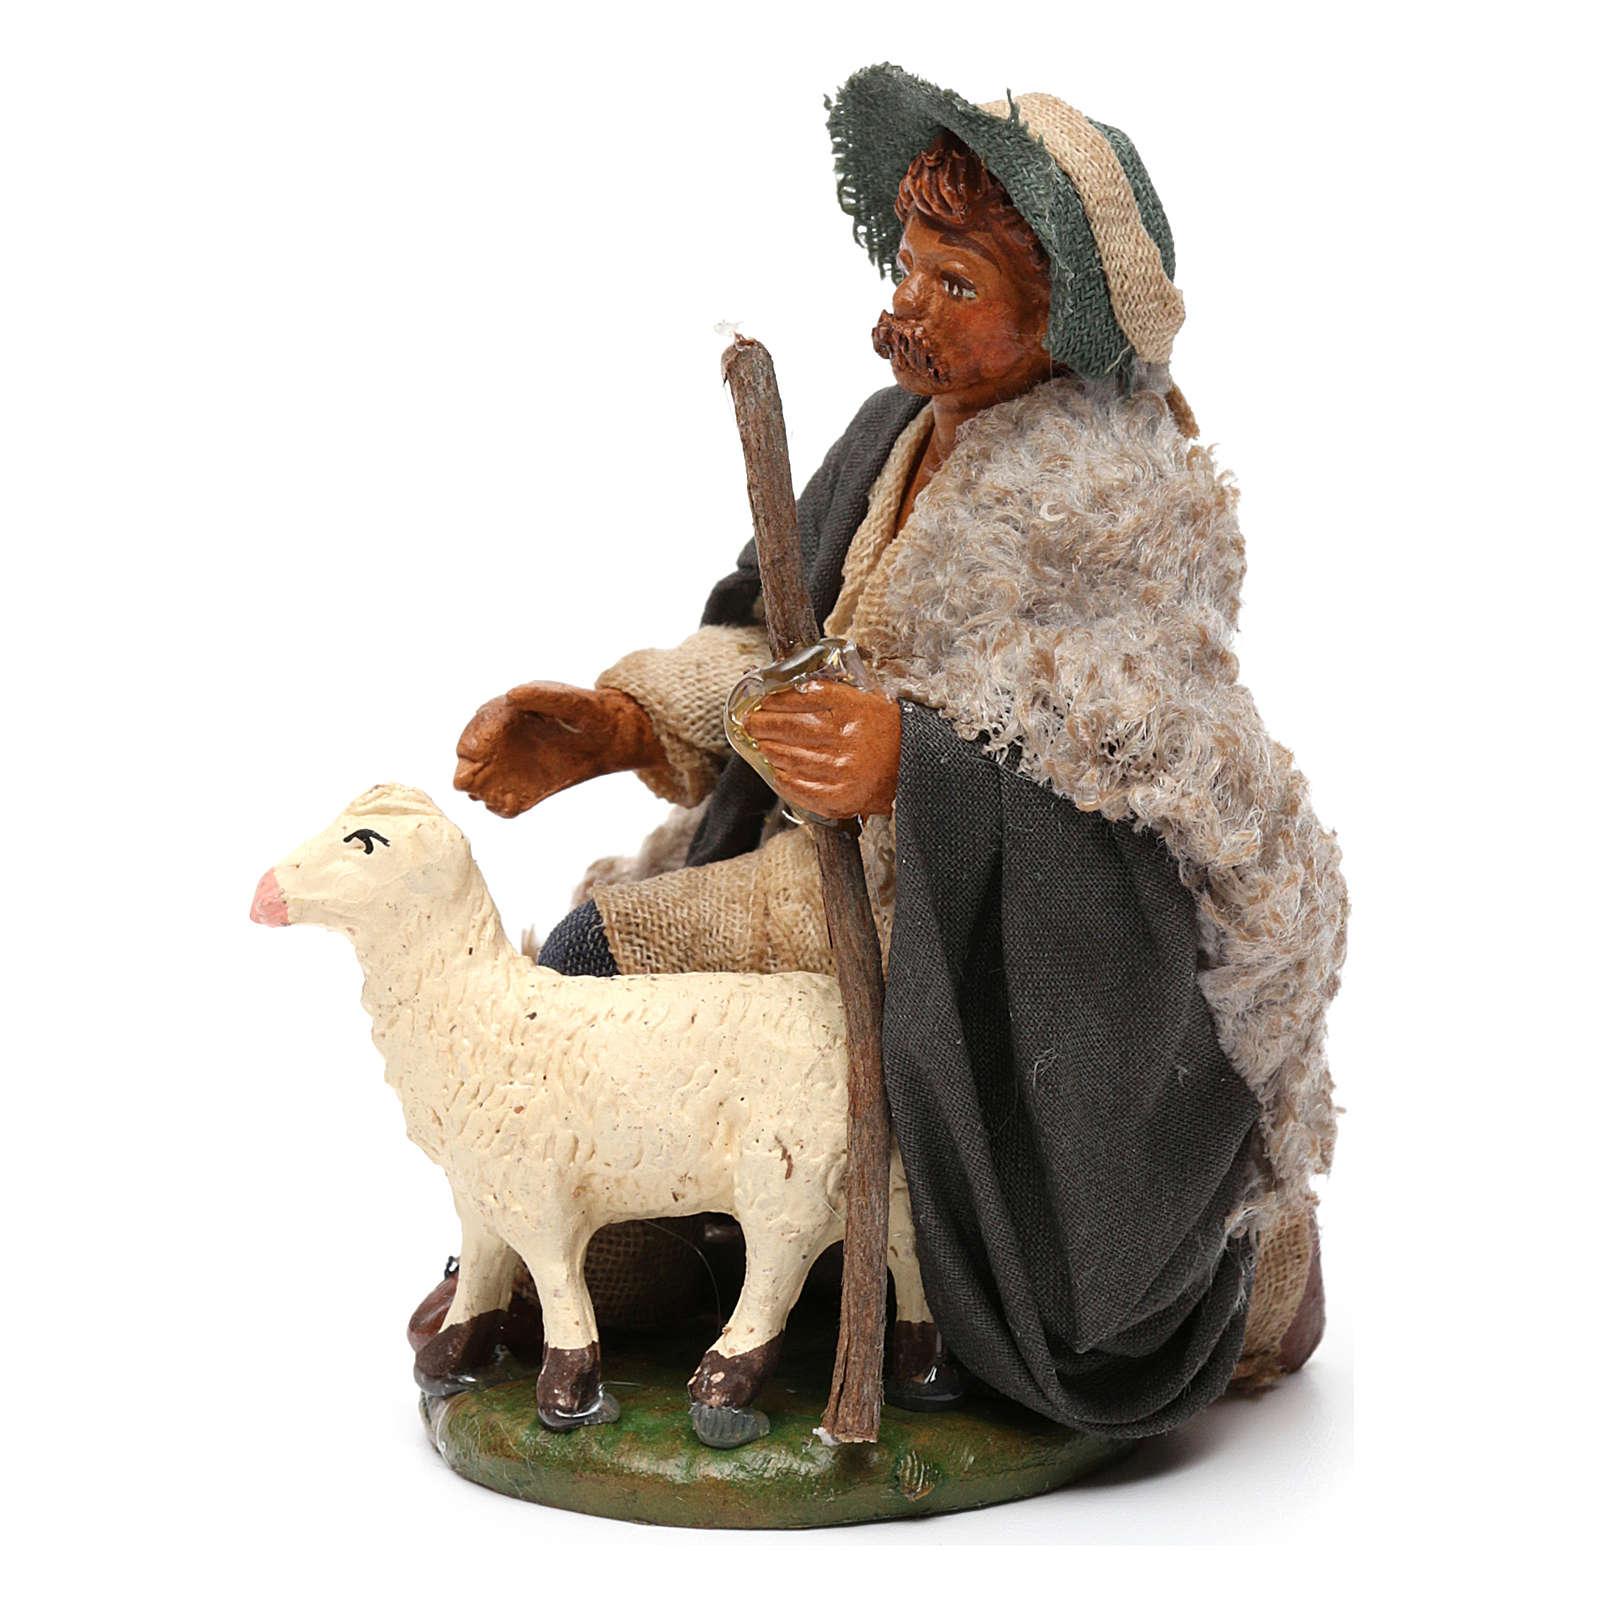 Nativity set accessory Kneeling shepherd sheep 10 cm figurines 4